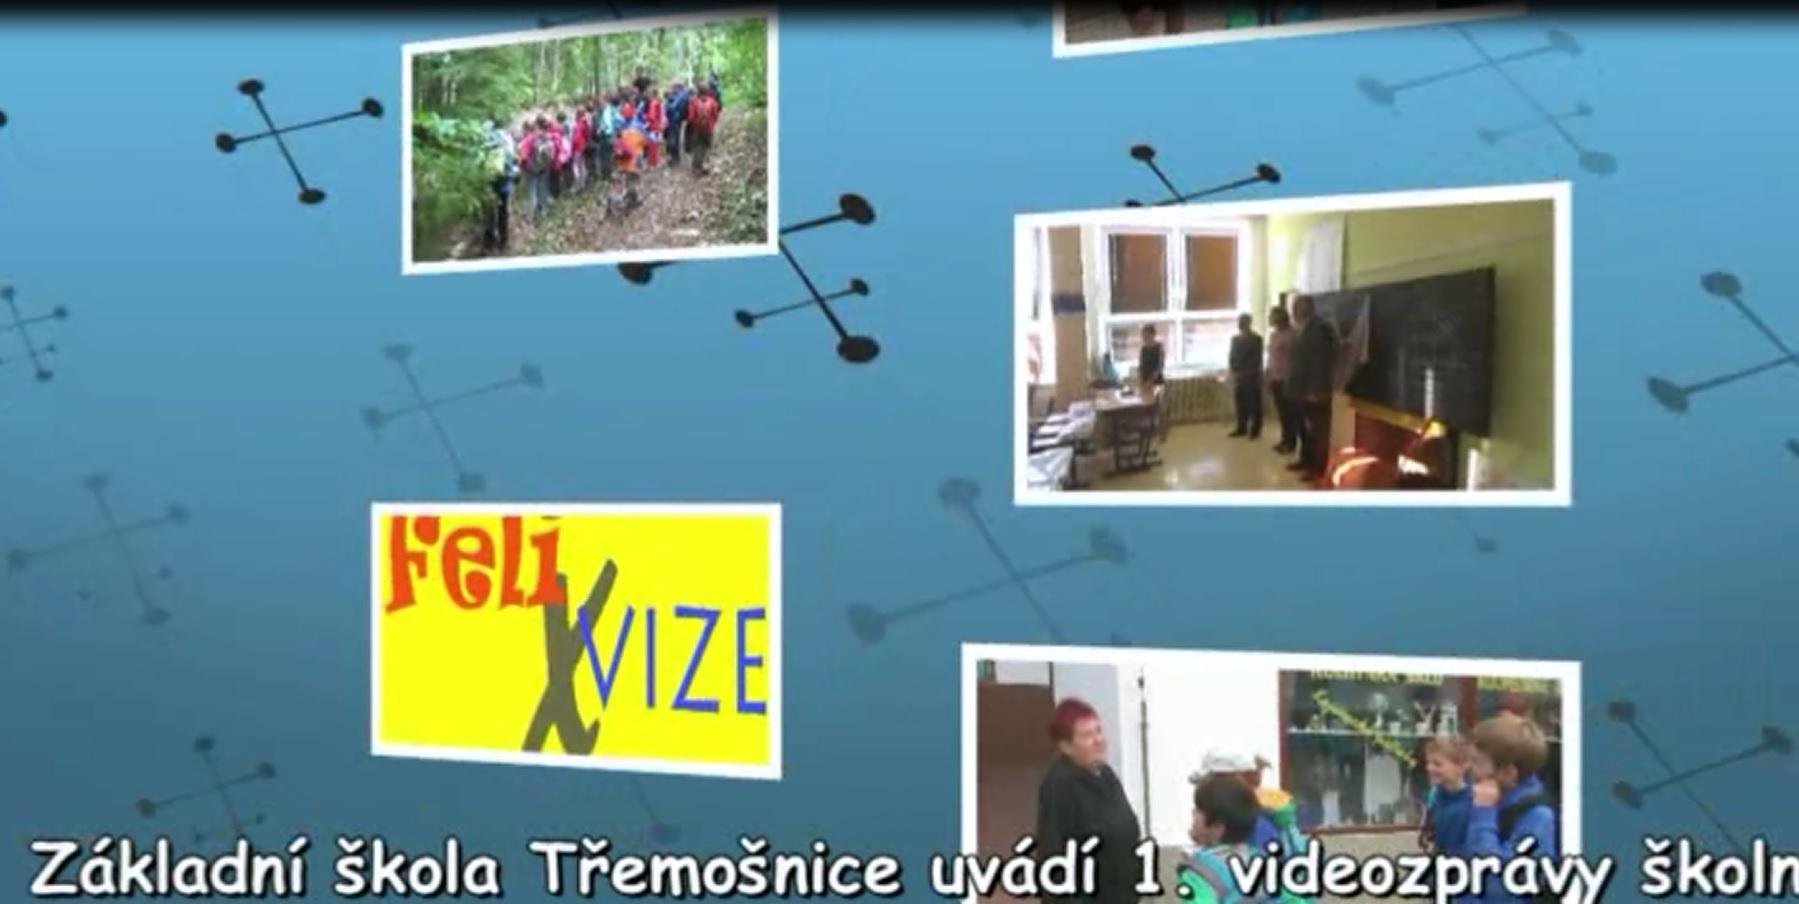 http://www.zs.tremosnice.indos.cz/videozpravy_15_16/1/1.jpg